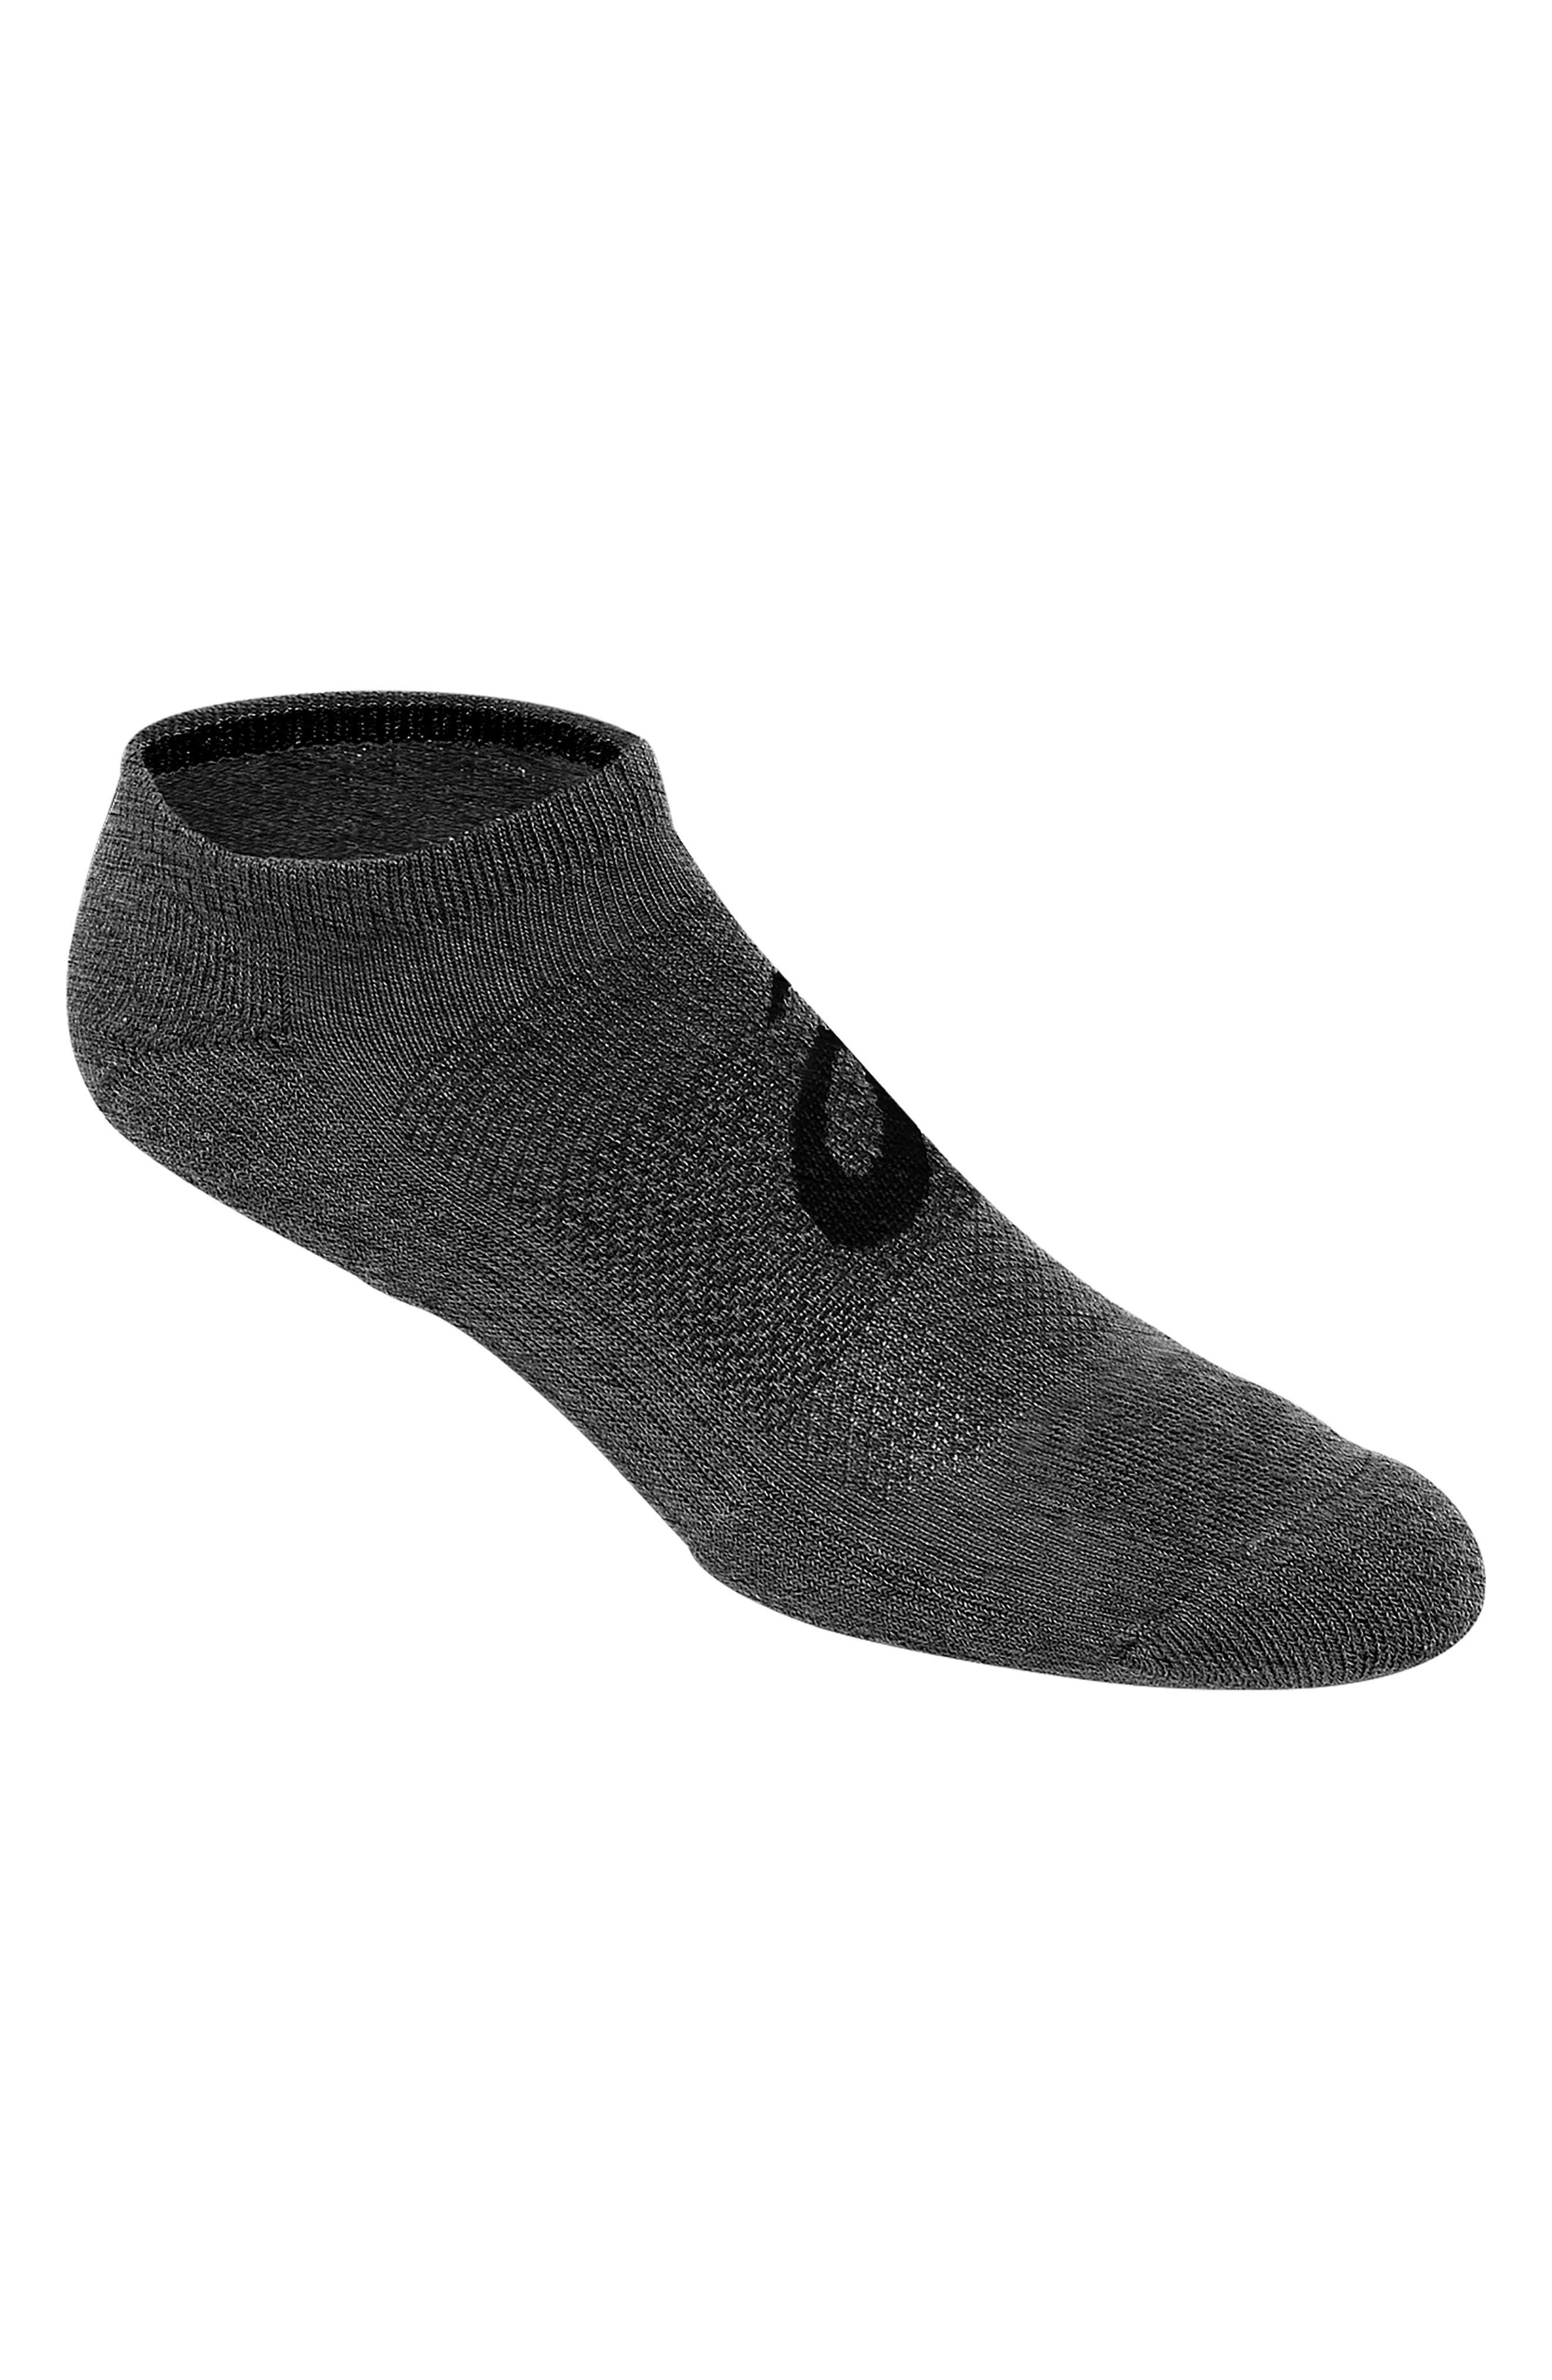 Men's Asics Invasion 3-Pack No-Show Socks